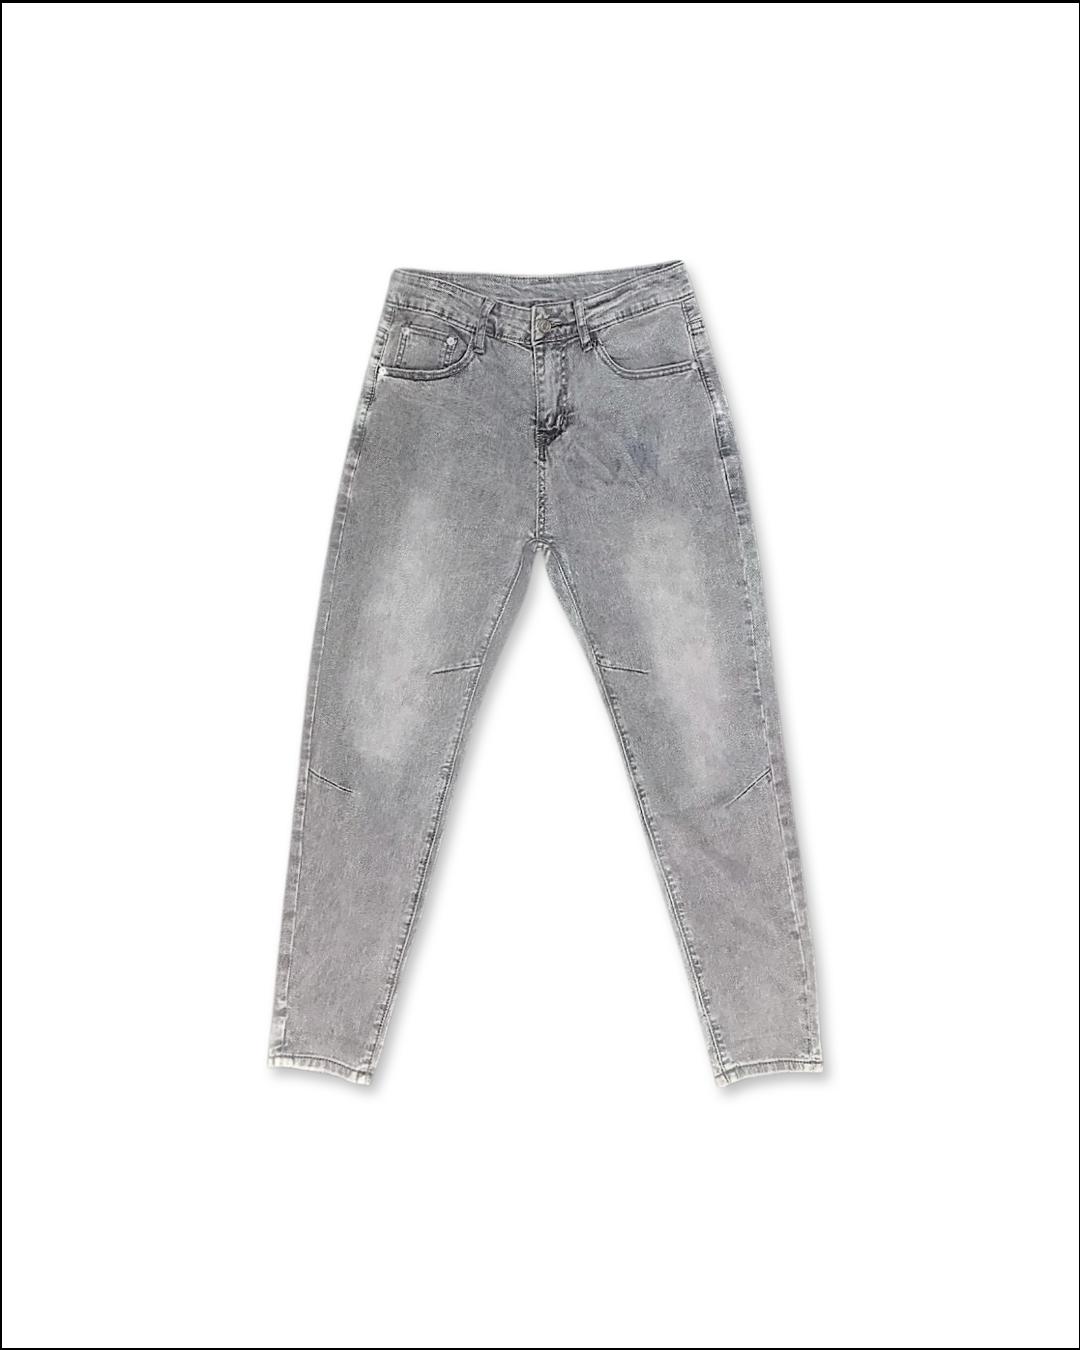 QJ-Tapered Grey